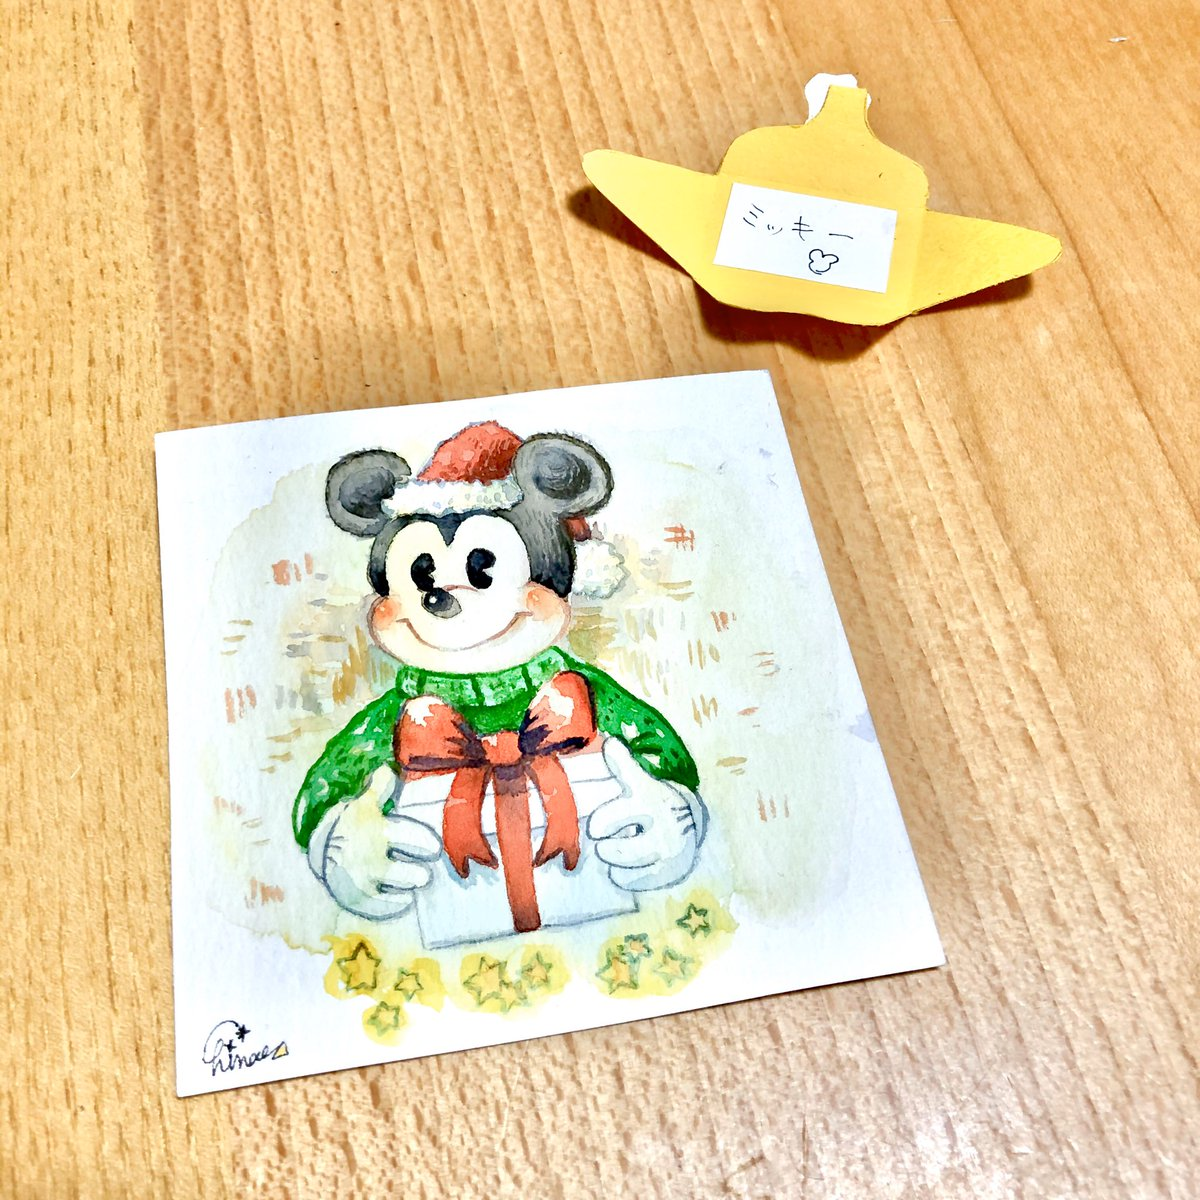 ট ইট র Chinae 12月1日のイラスト クリスマス ミッキー イラスト イラストアドベントカレンダー アドベントカレンダー 水彩画 絵描きさんと繫がりたい